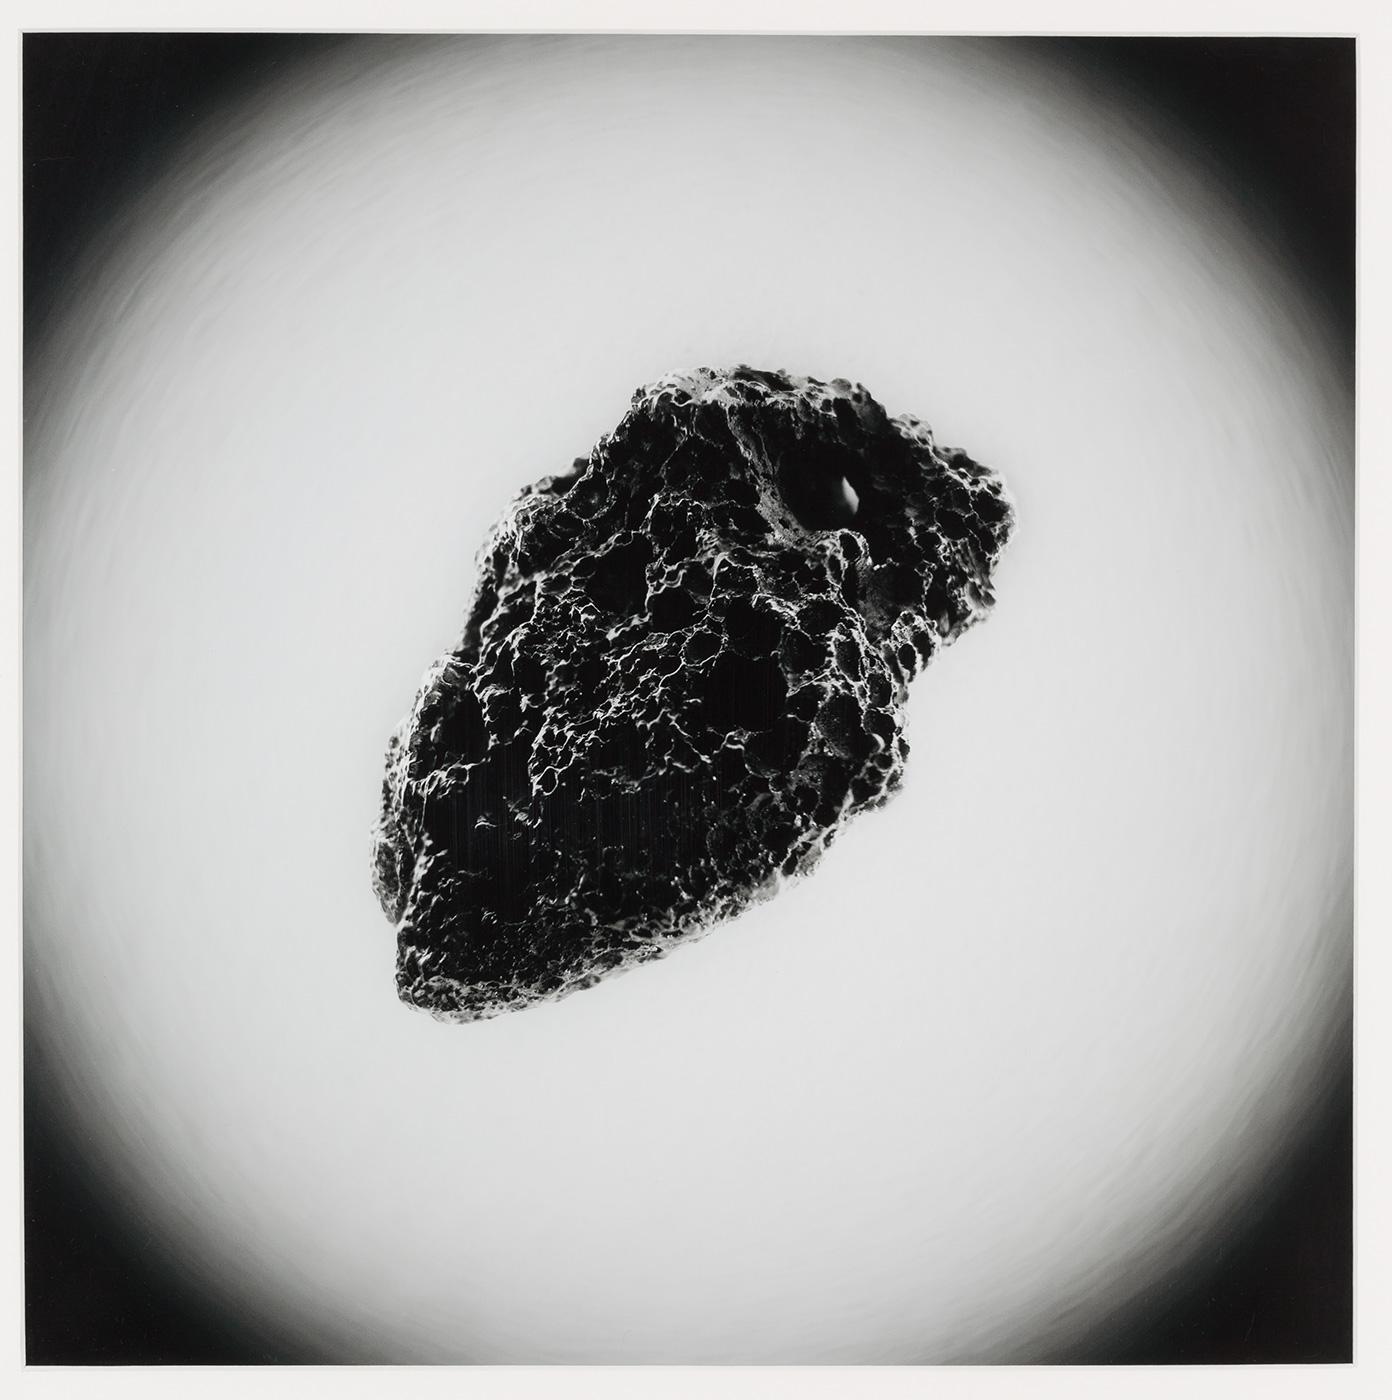 Travis Hocutt - Micrometeorite II